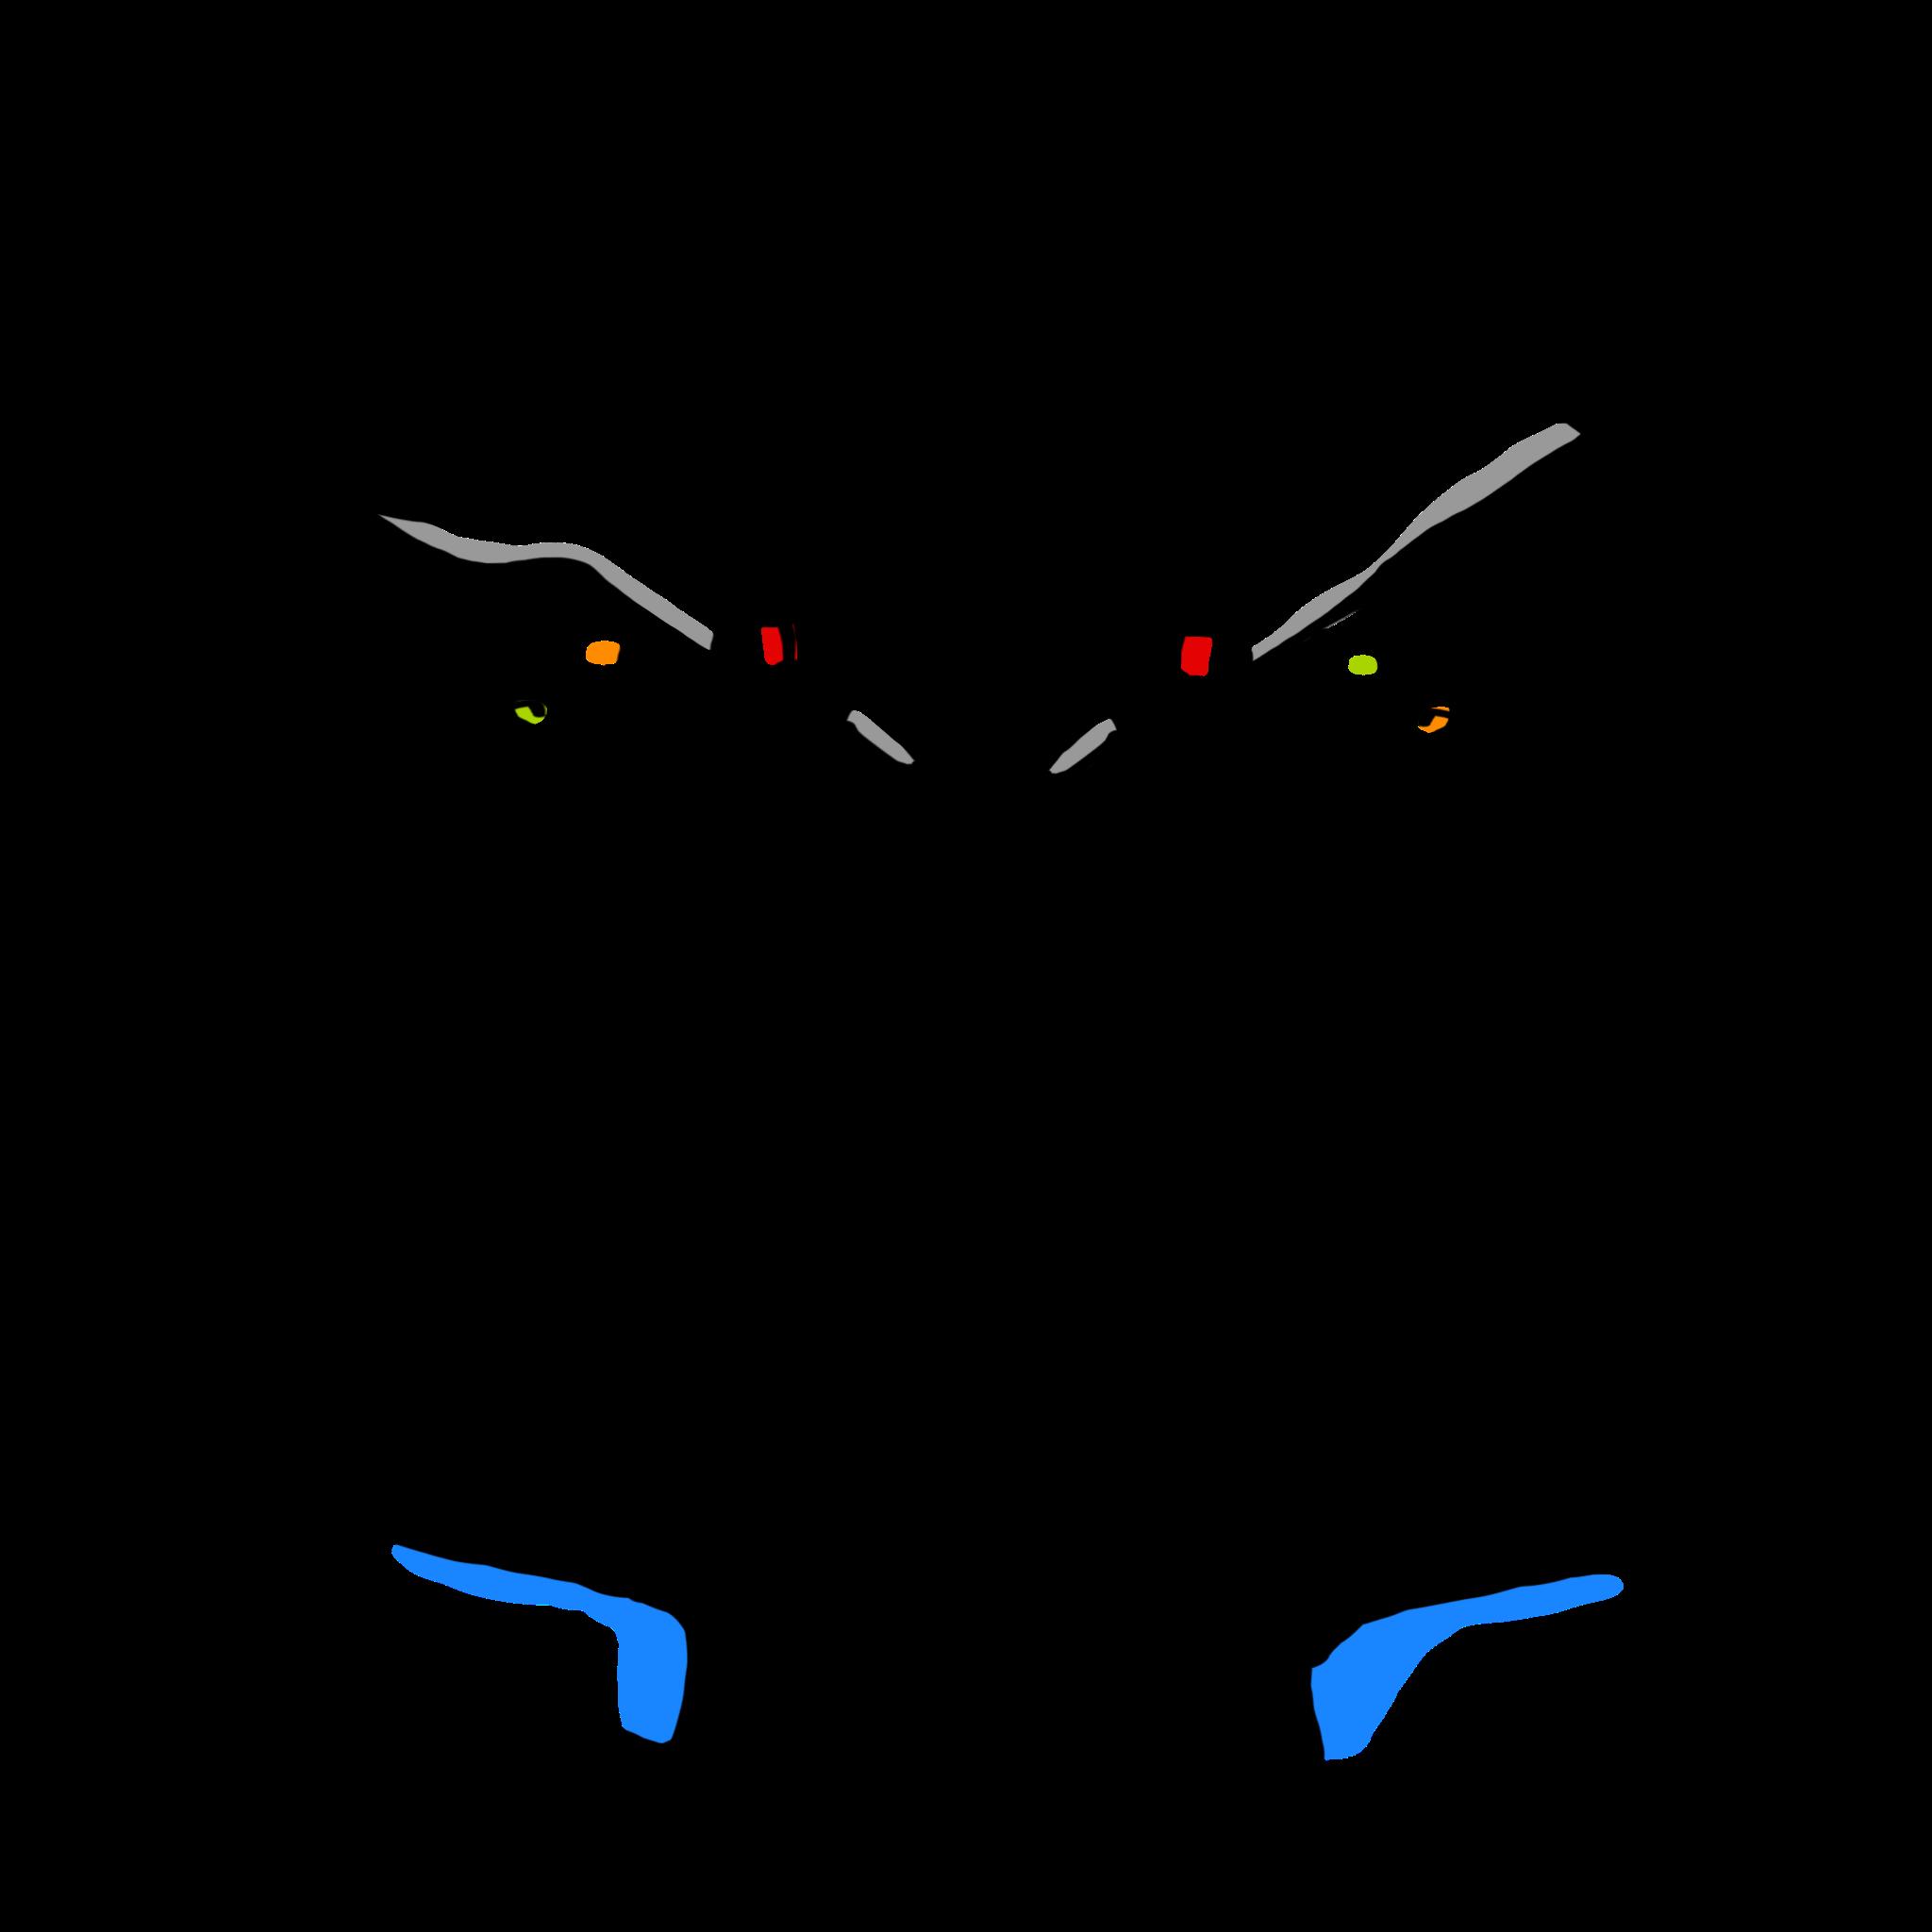 Ata-med-fot-illustration-maja-larsson